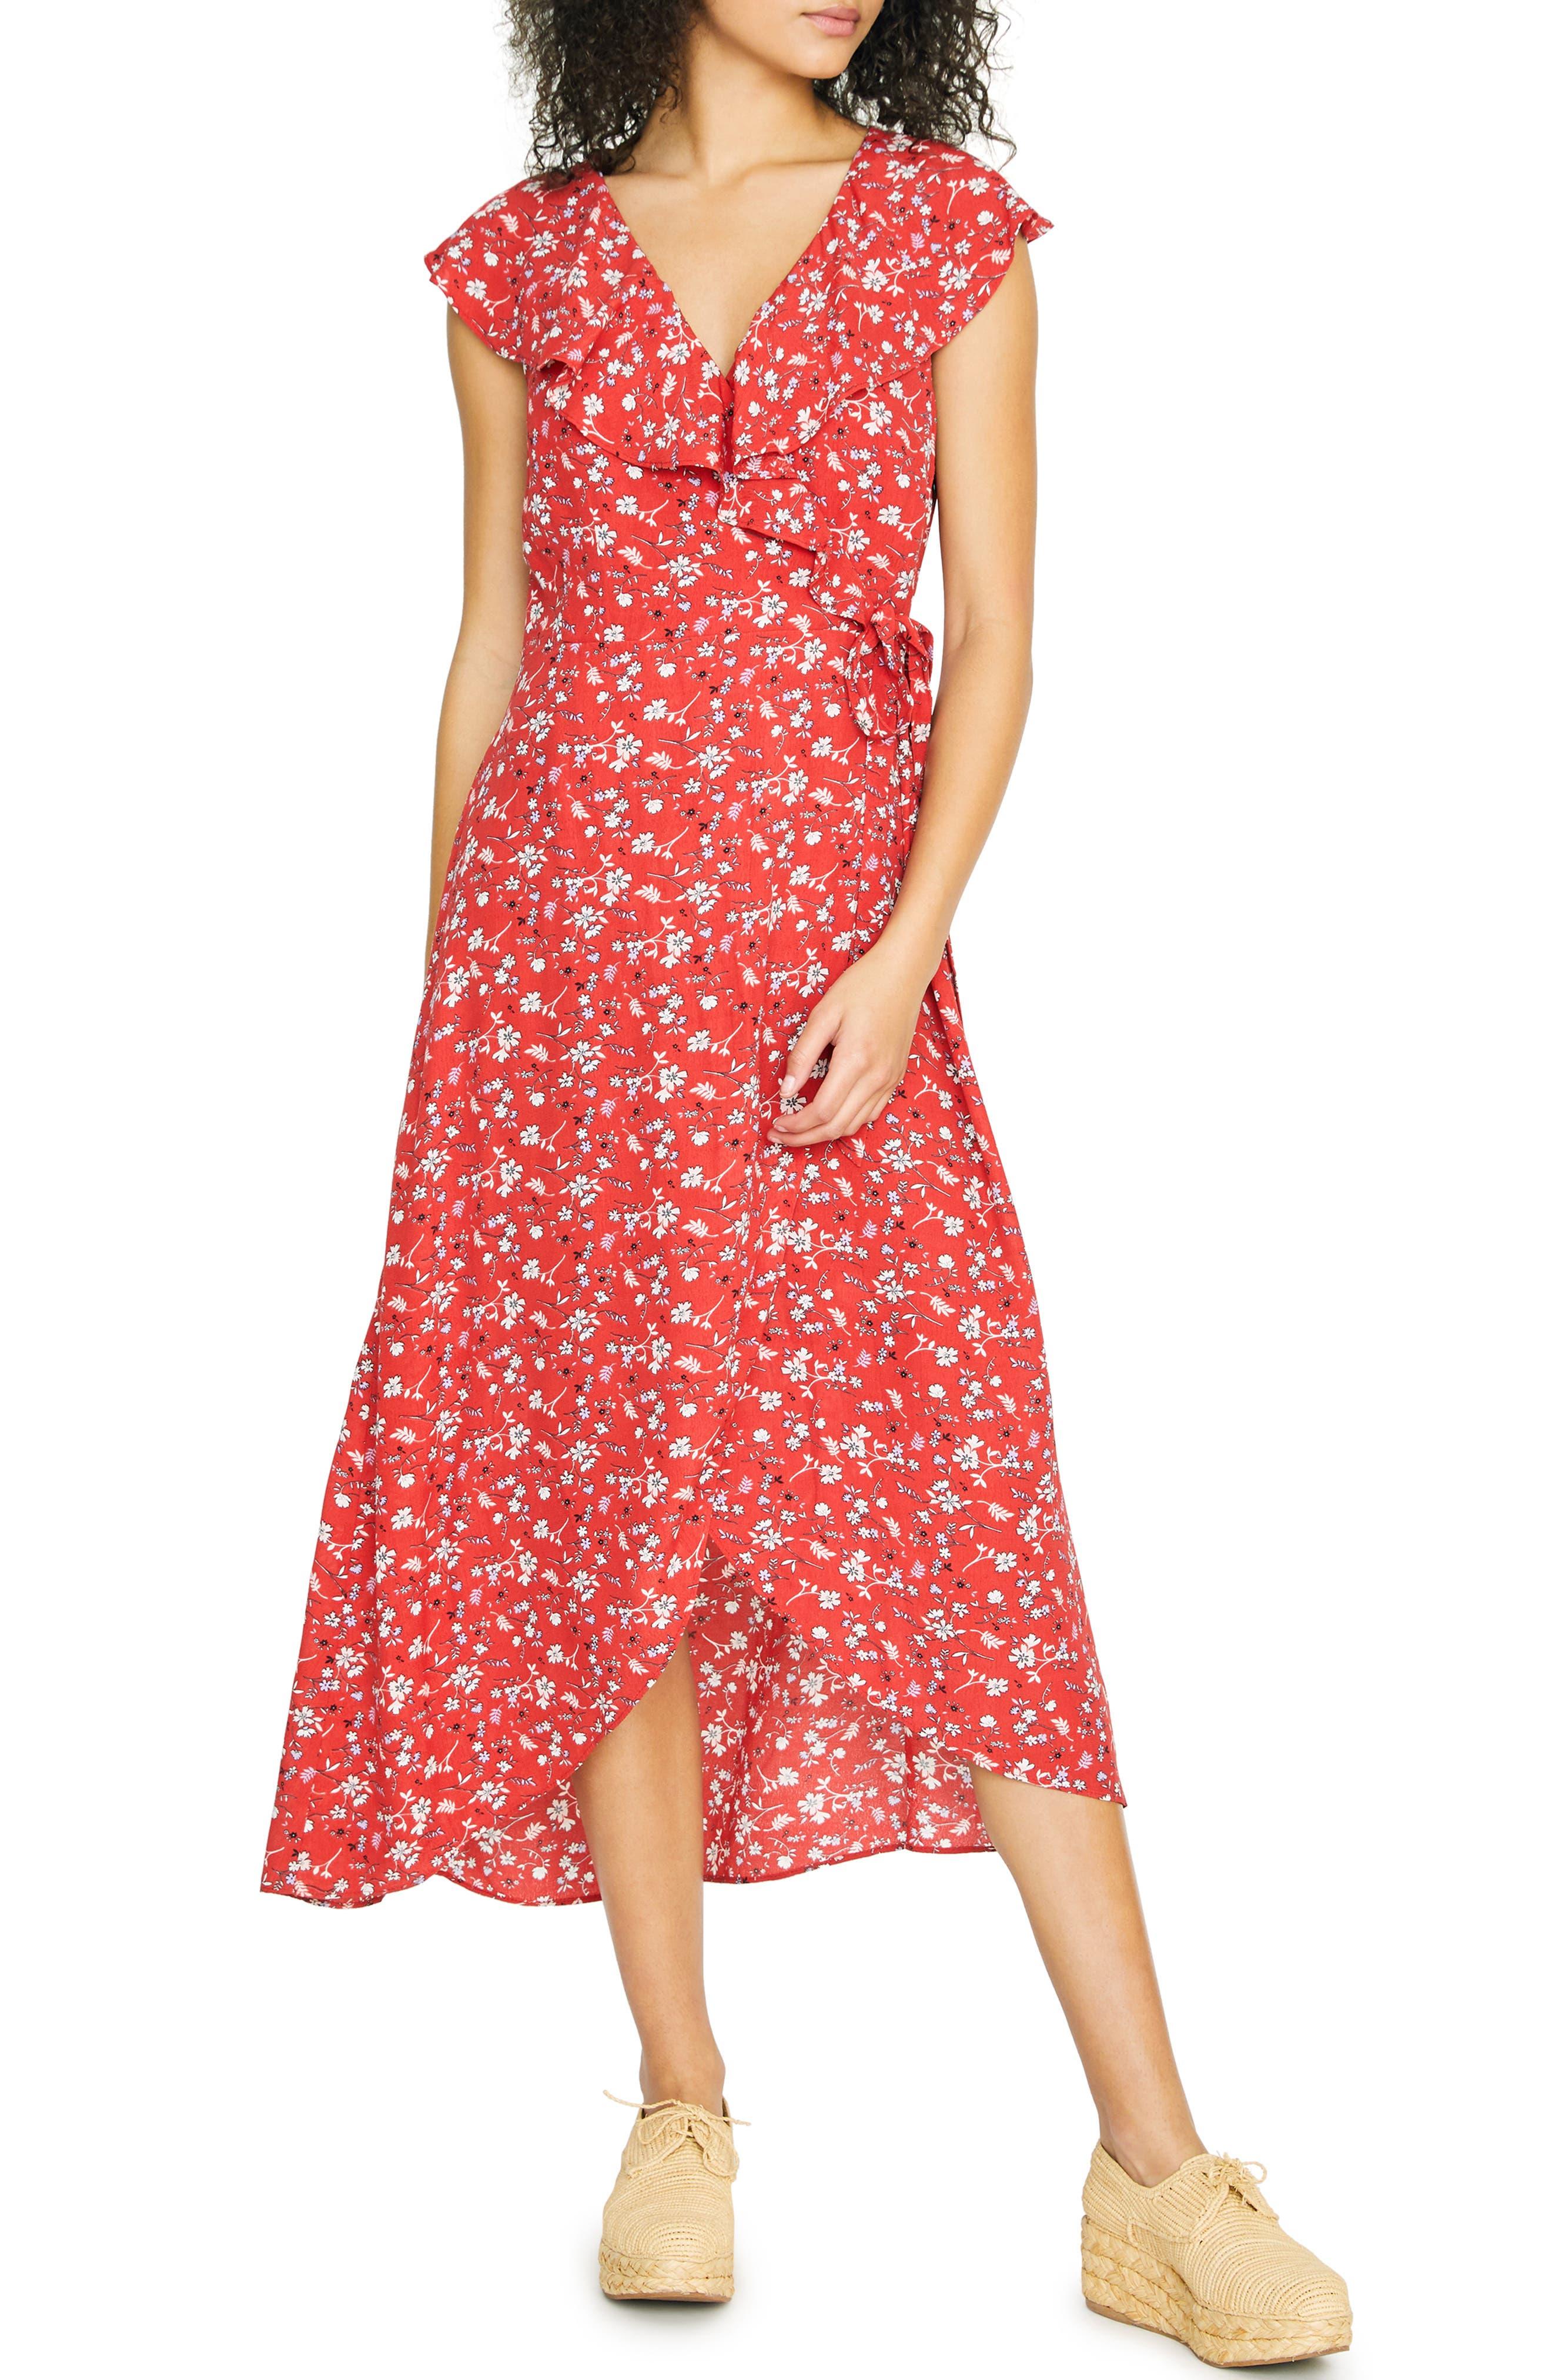 SANCTUARY, Jolynn Faux Wrap Midi Dress, Main thumbnail 1, color, SIMPLY RED